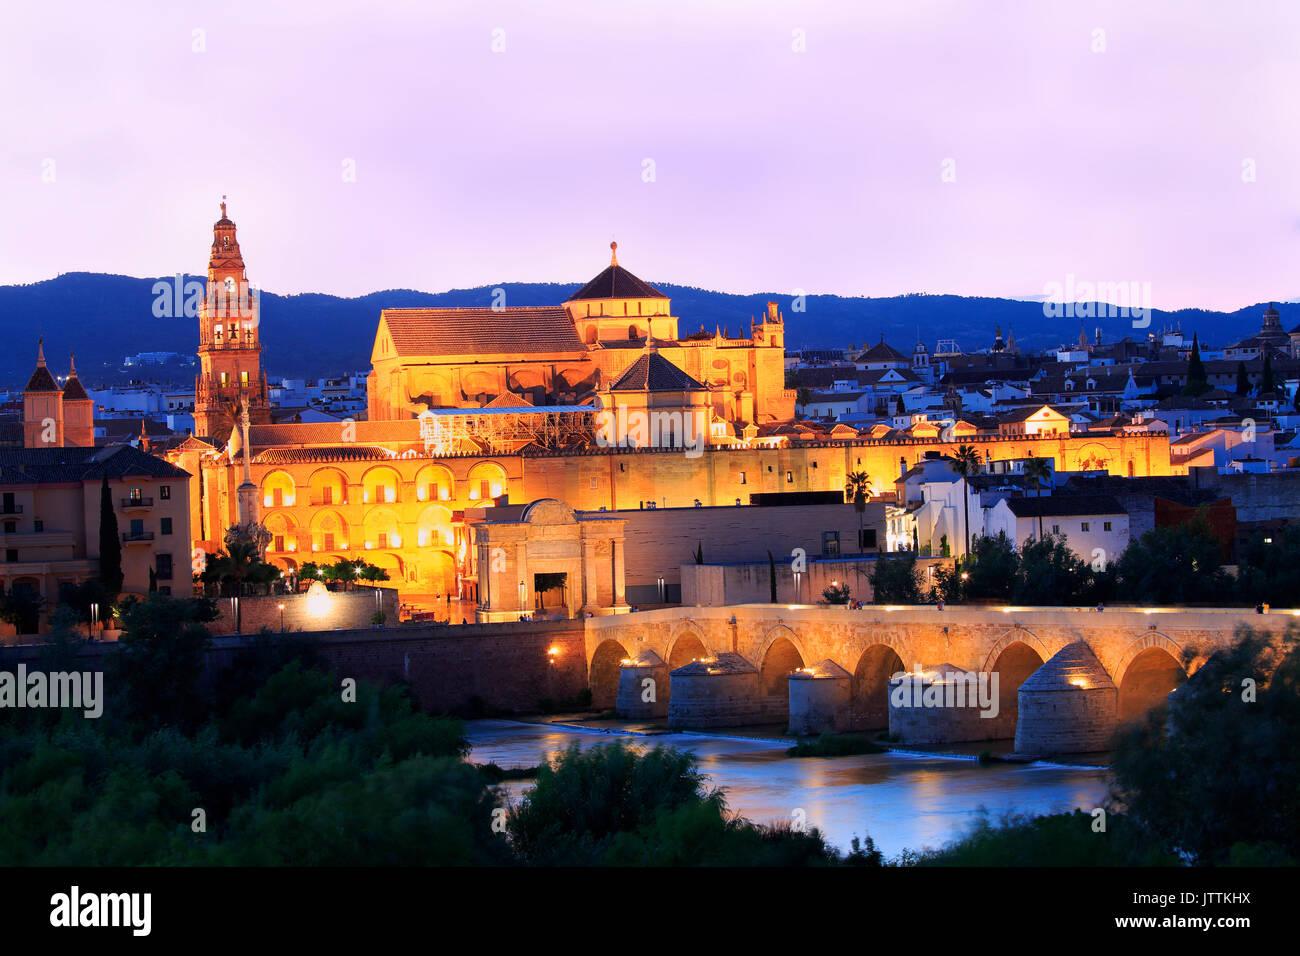 Roman Bridge and Guadalquivir River illuminated at dusk, Great Mosque in Cordoba, Spain - Stock Image